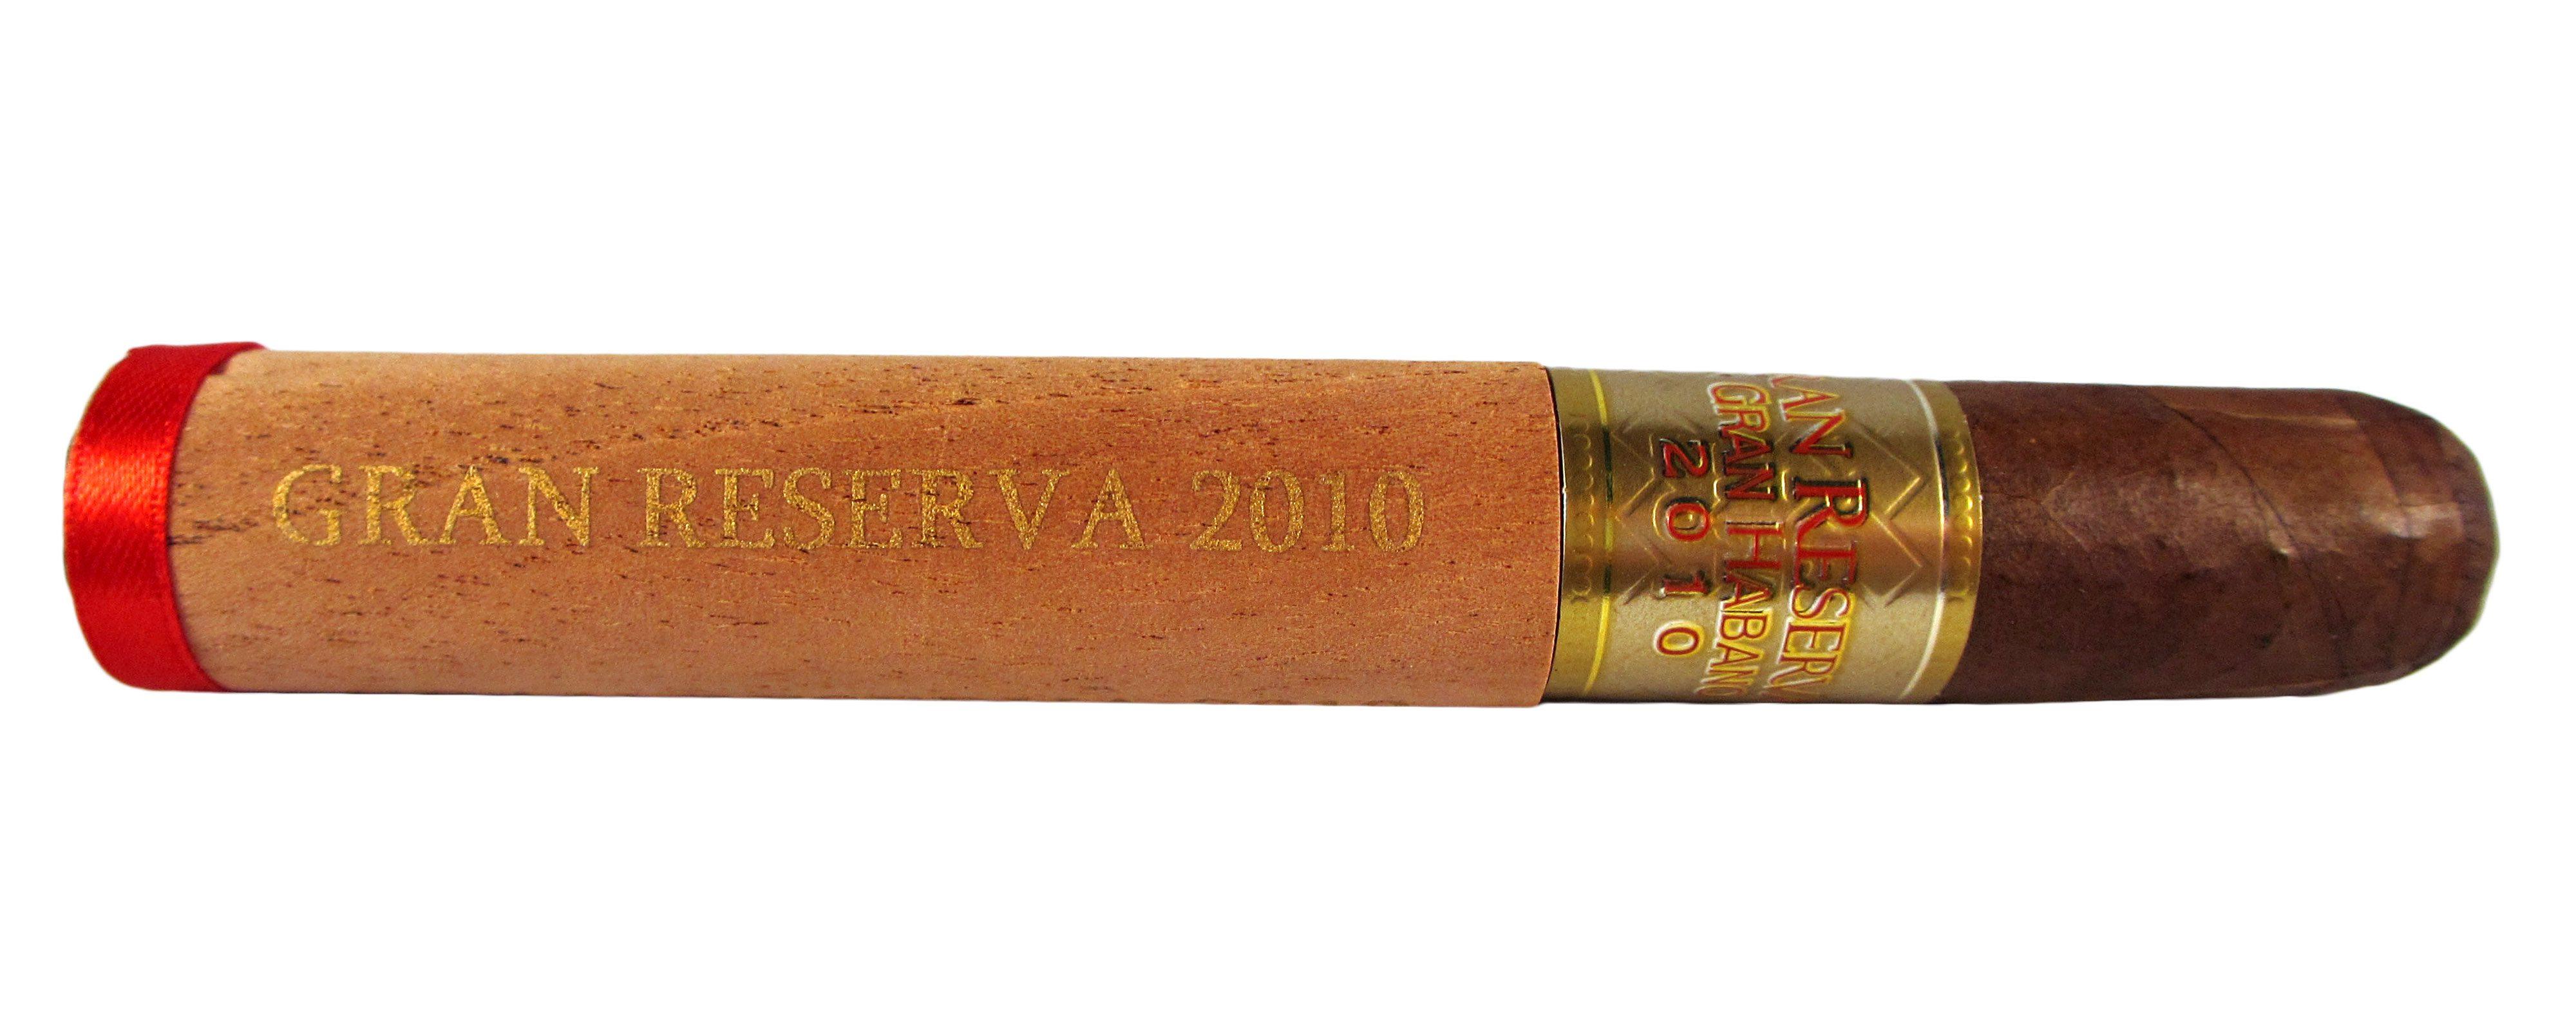 Blind Cigar Review: Gran Habano | Gran Reserva #5 2010 Gran Robusto